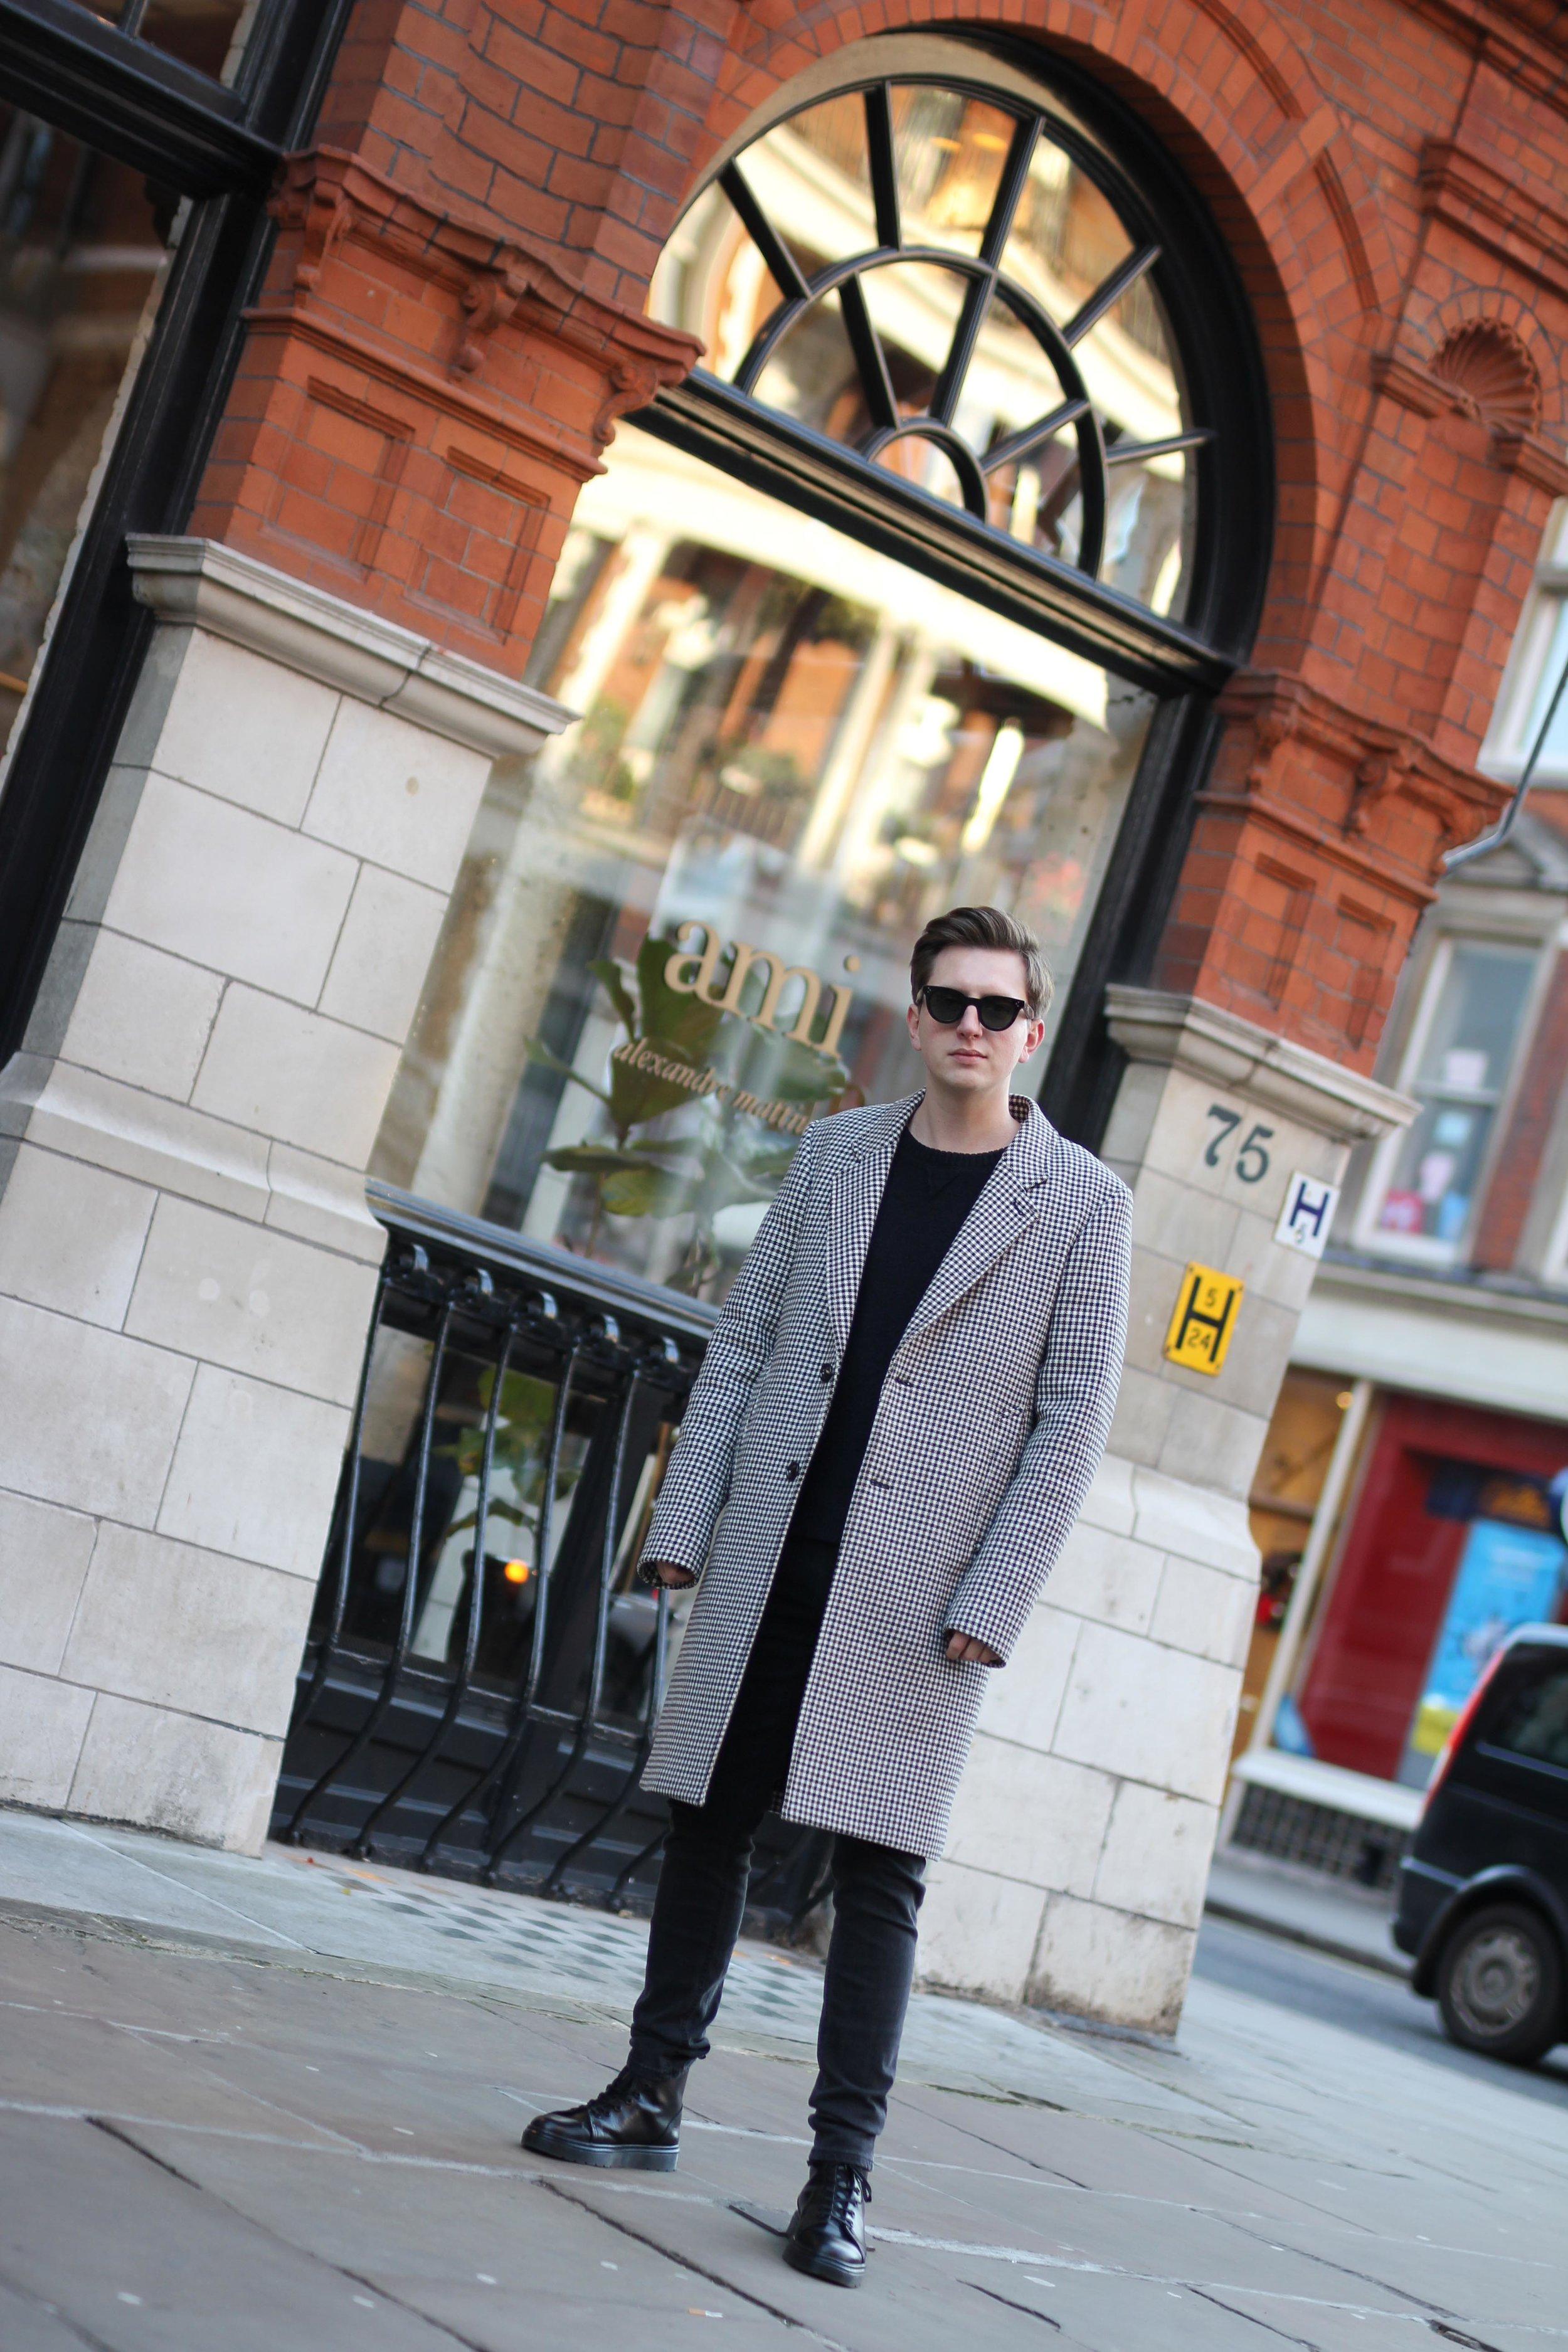 london_menswear_rolandas_lusinskis_celine_acne_studios